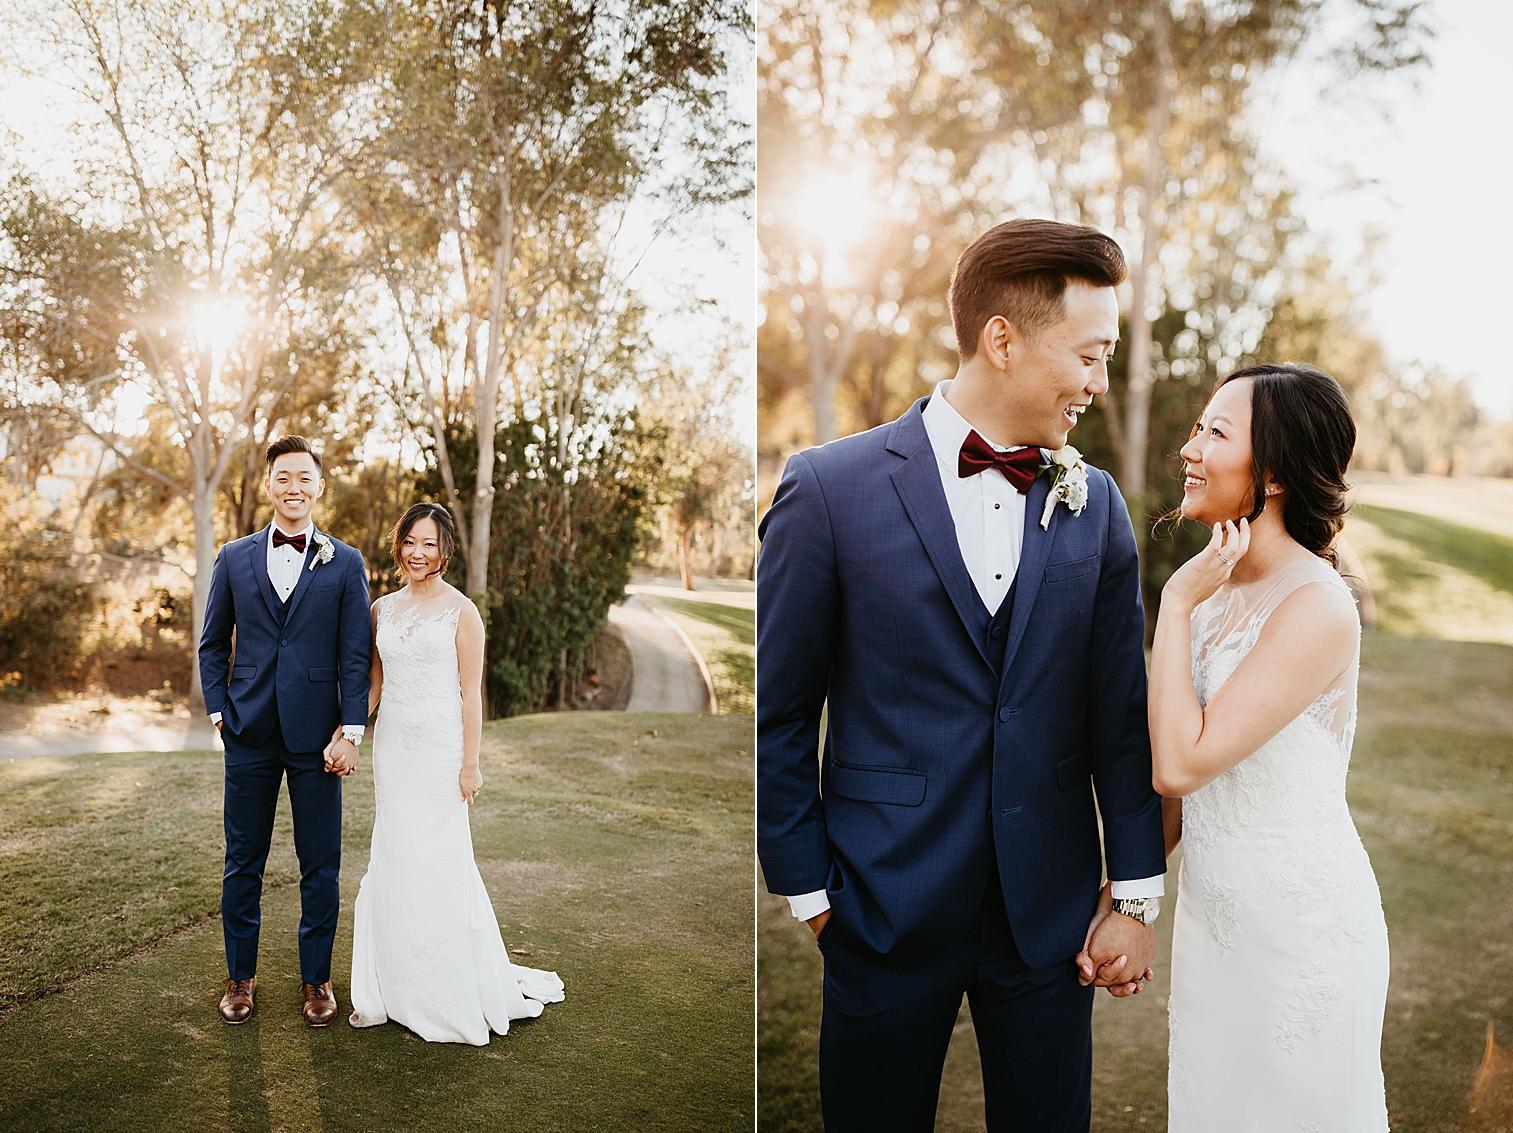 Secret-Garden-Rancho-Santa-Fe-Wedding-105.jpg